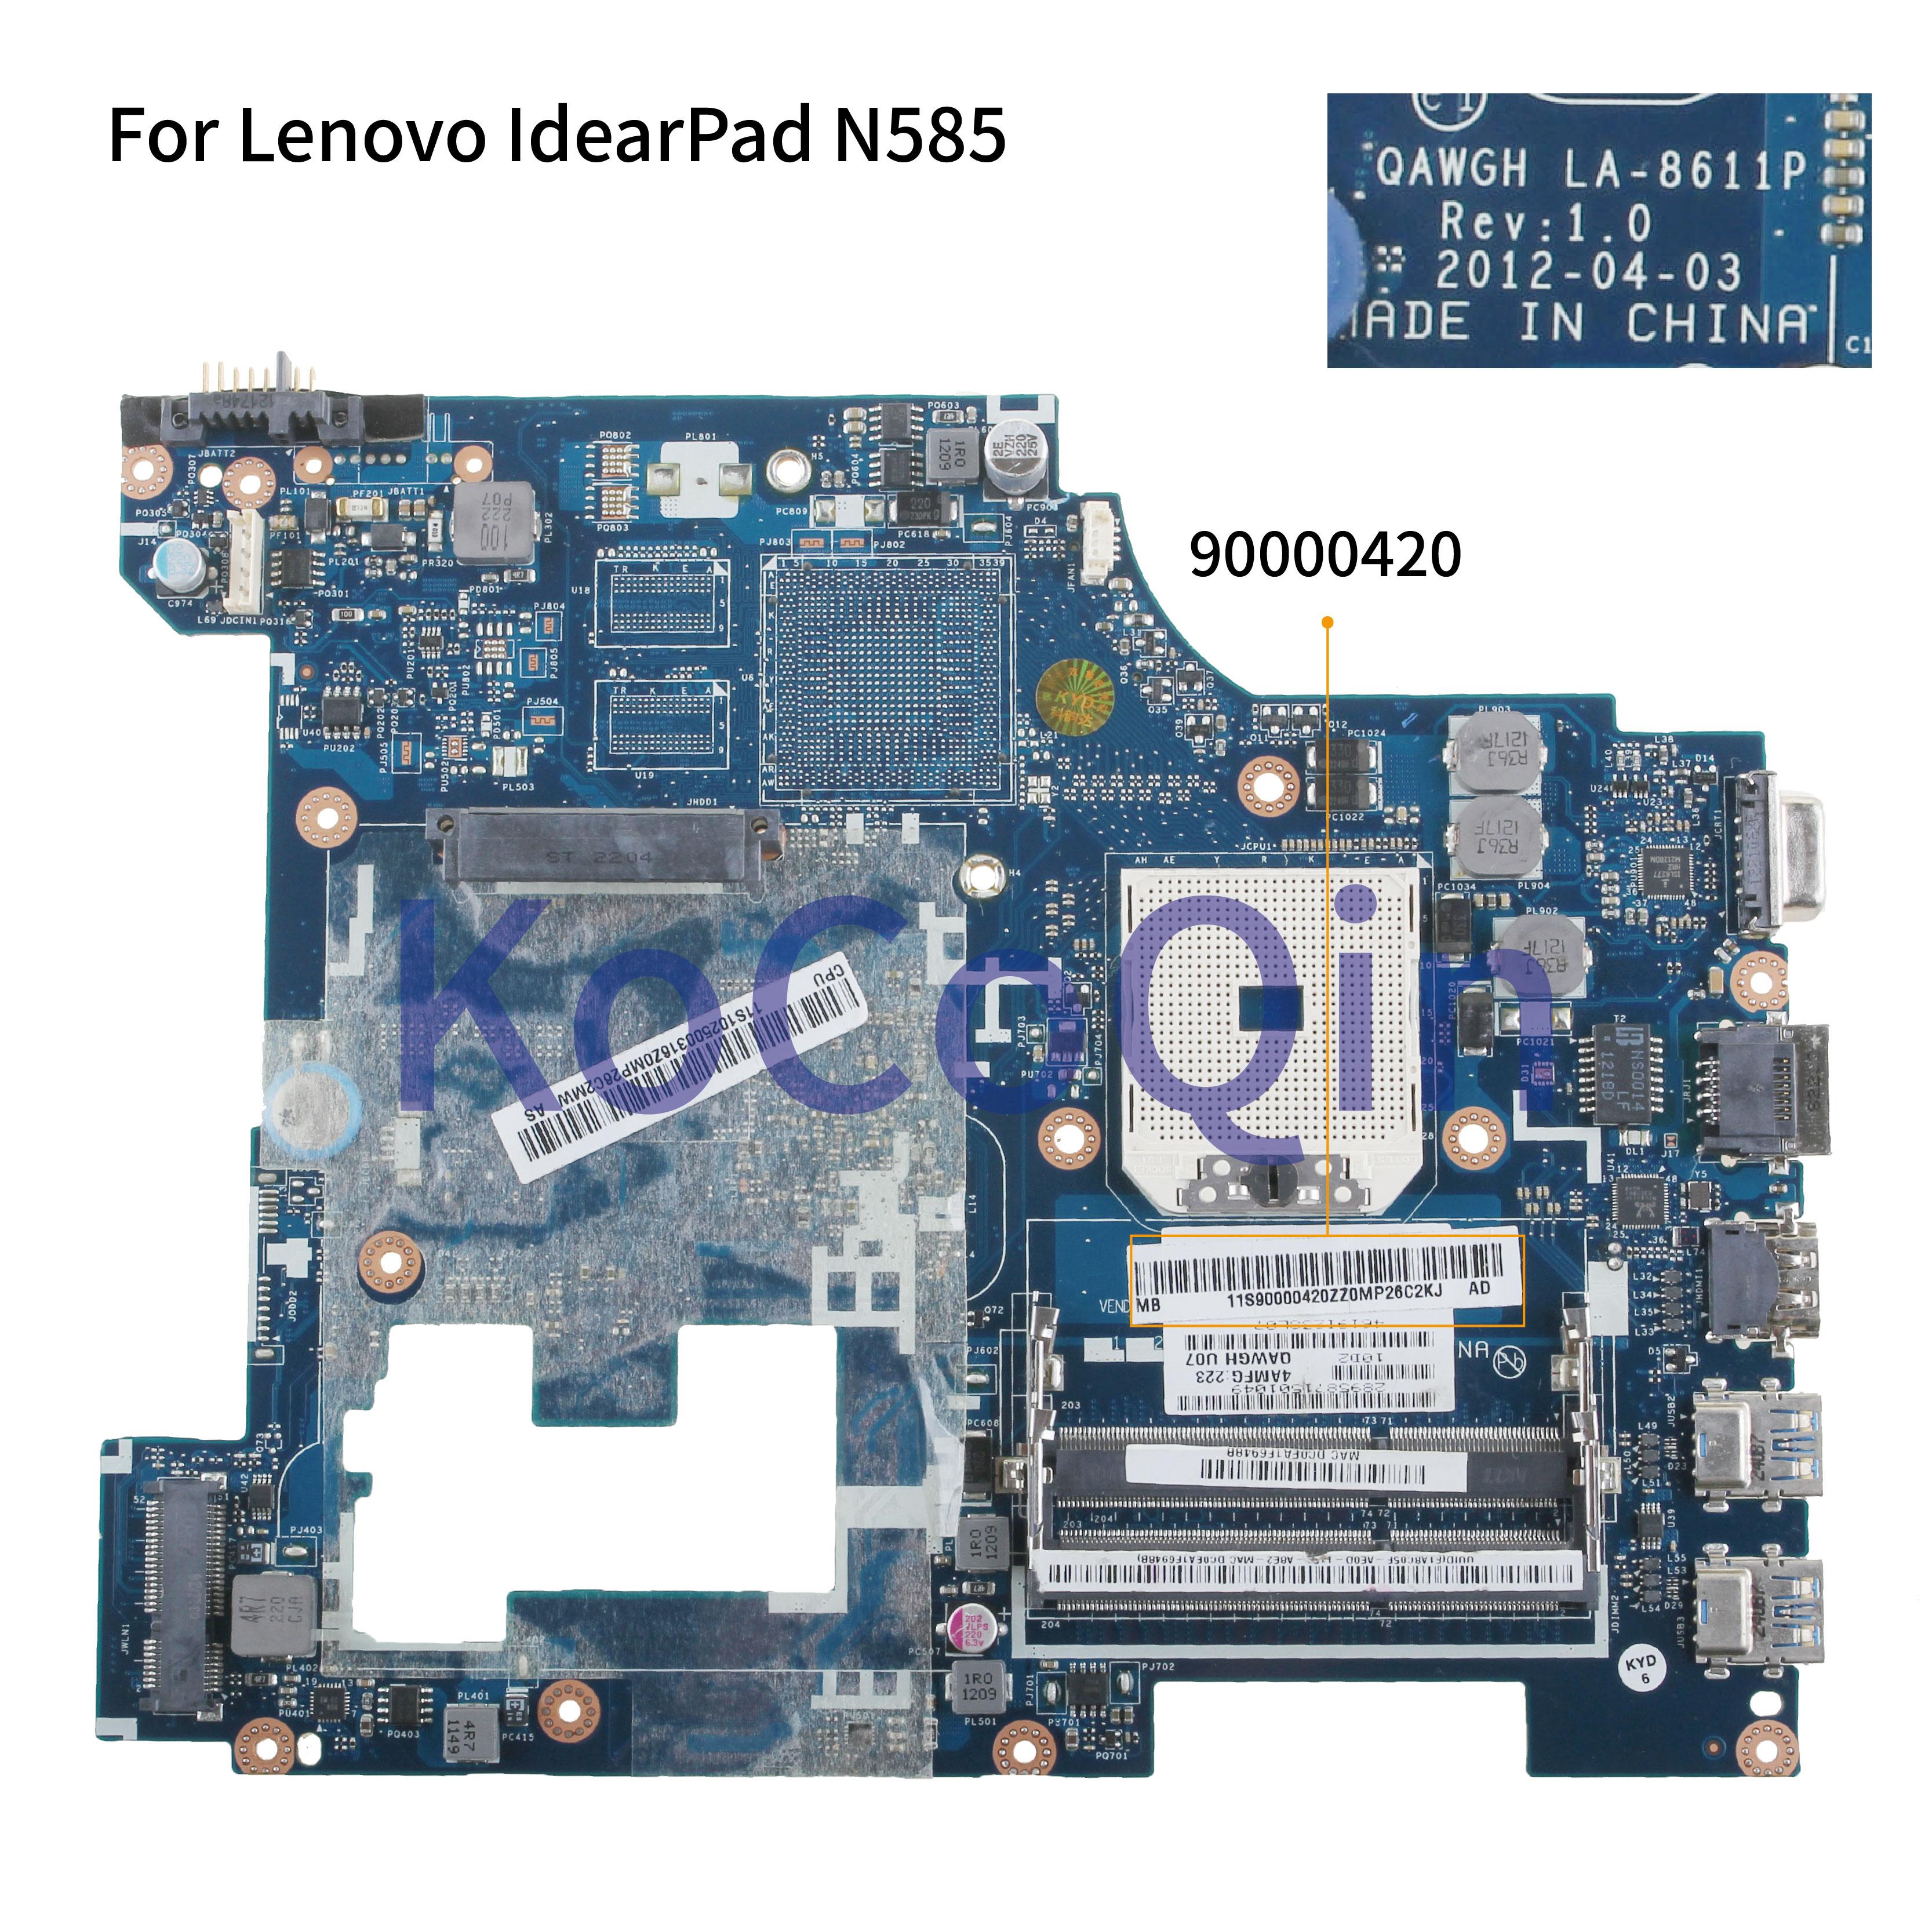 KoCoQin Laptop Motherboard For Lenovo P585 G585 N585 Mainboard QAWGH LA-8611P 90000420 AMD